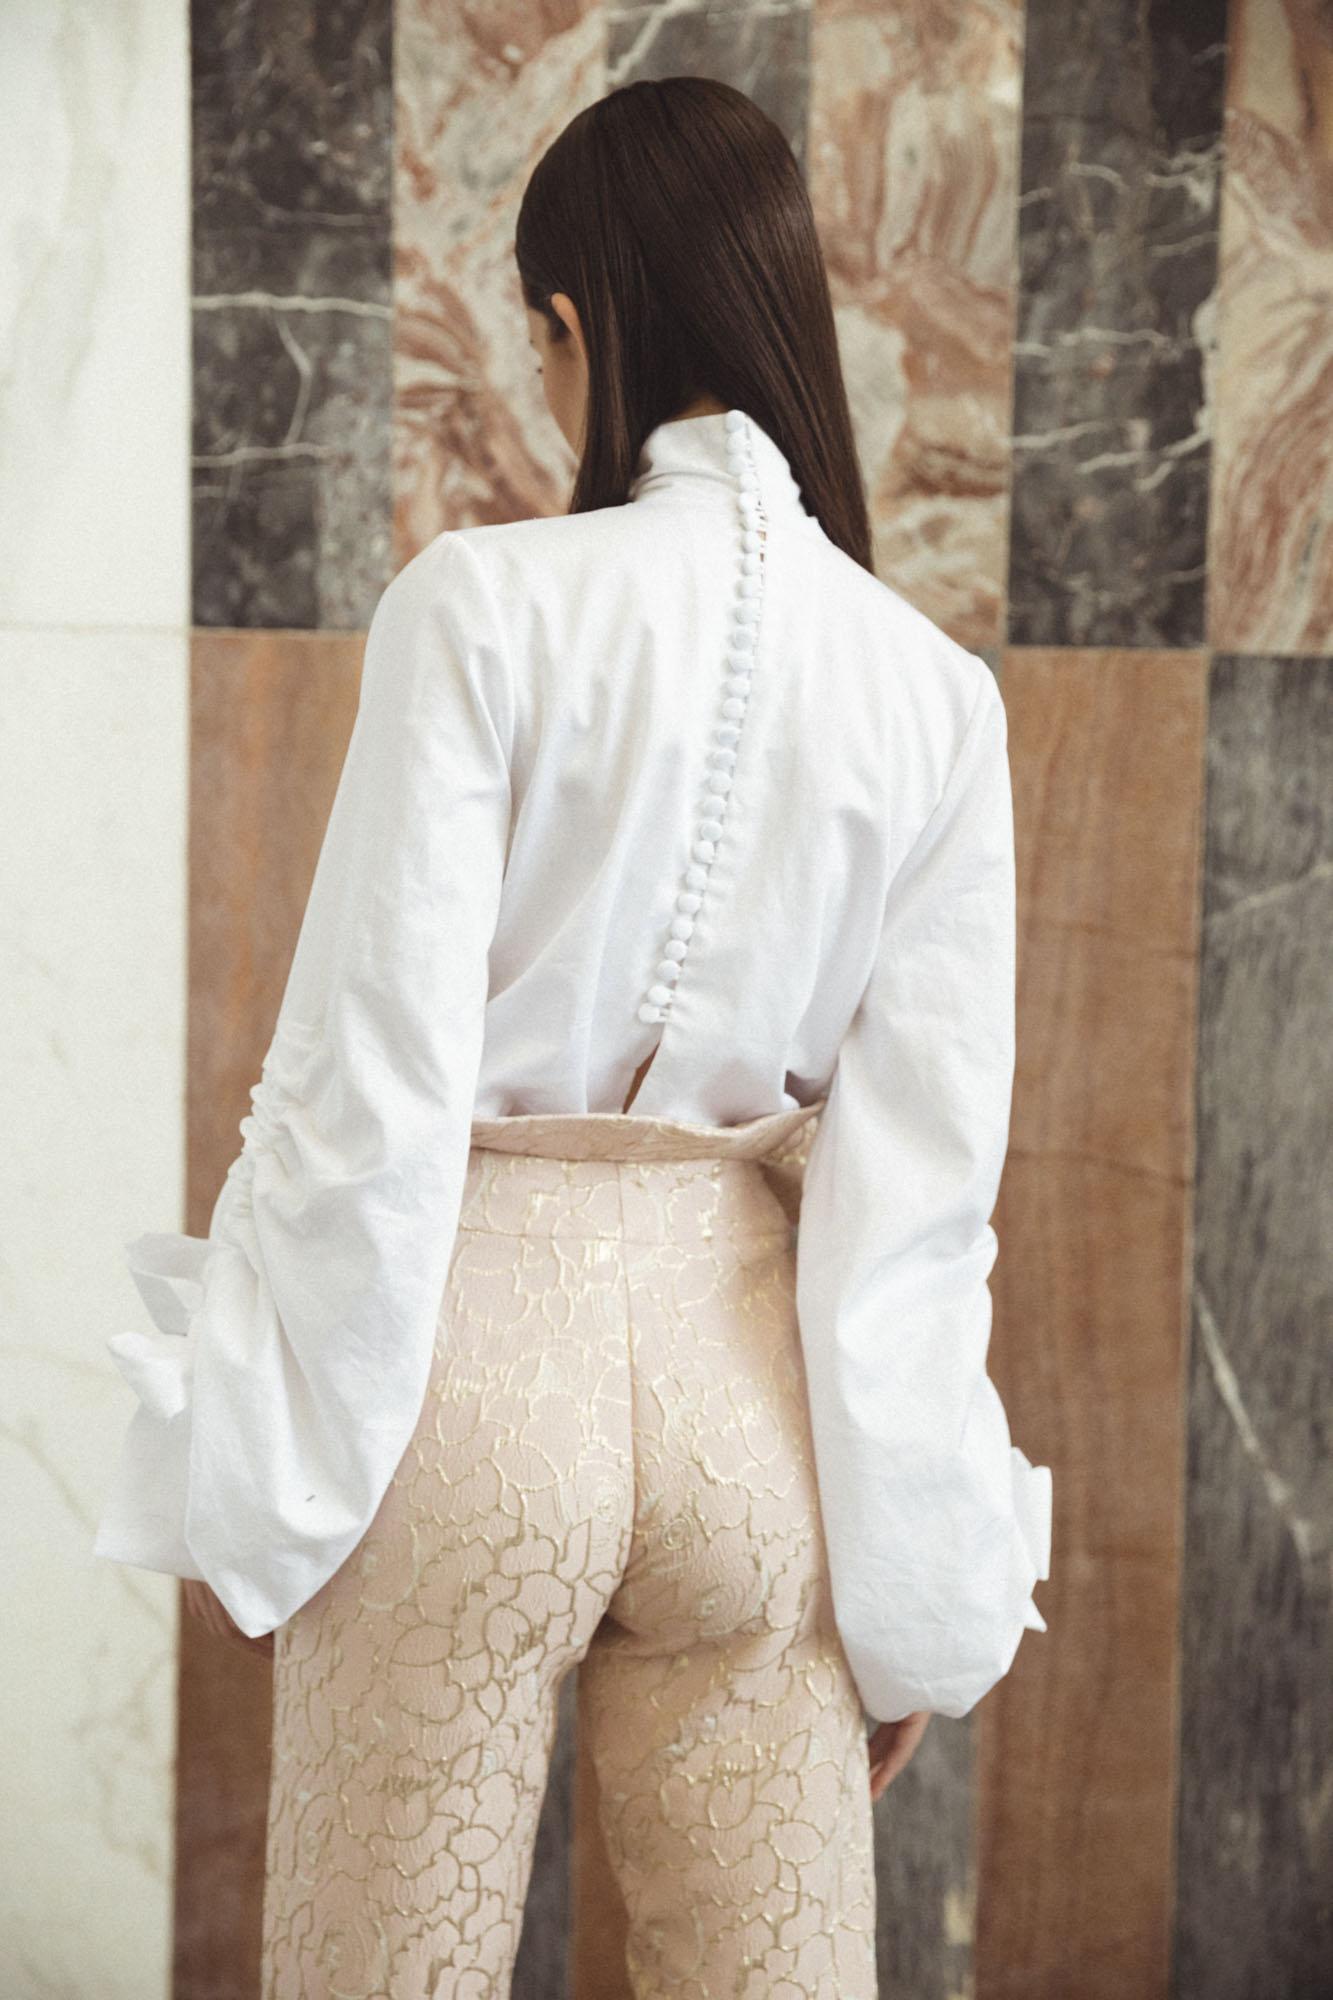 efrain_mogollon_femineus_cloe_ shirt - _emmanuelle_ pabts2.JPG